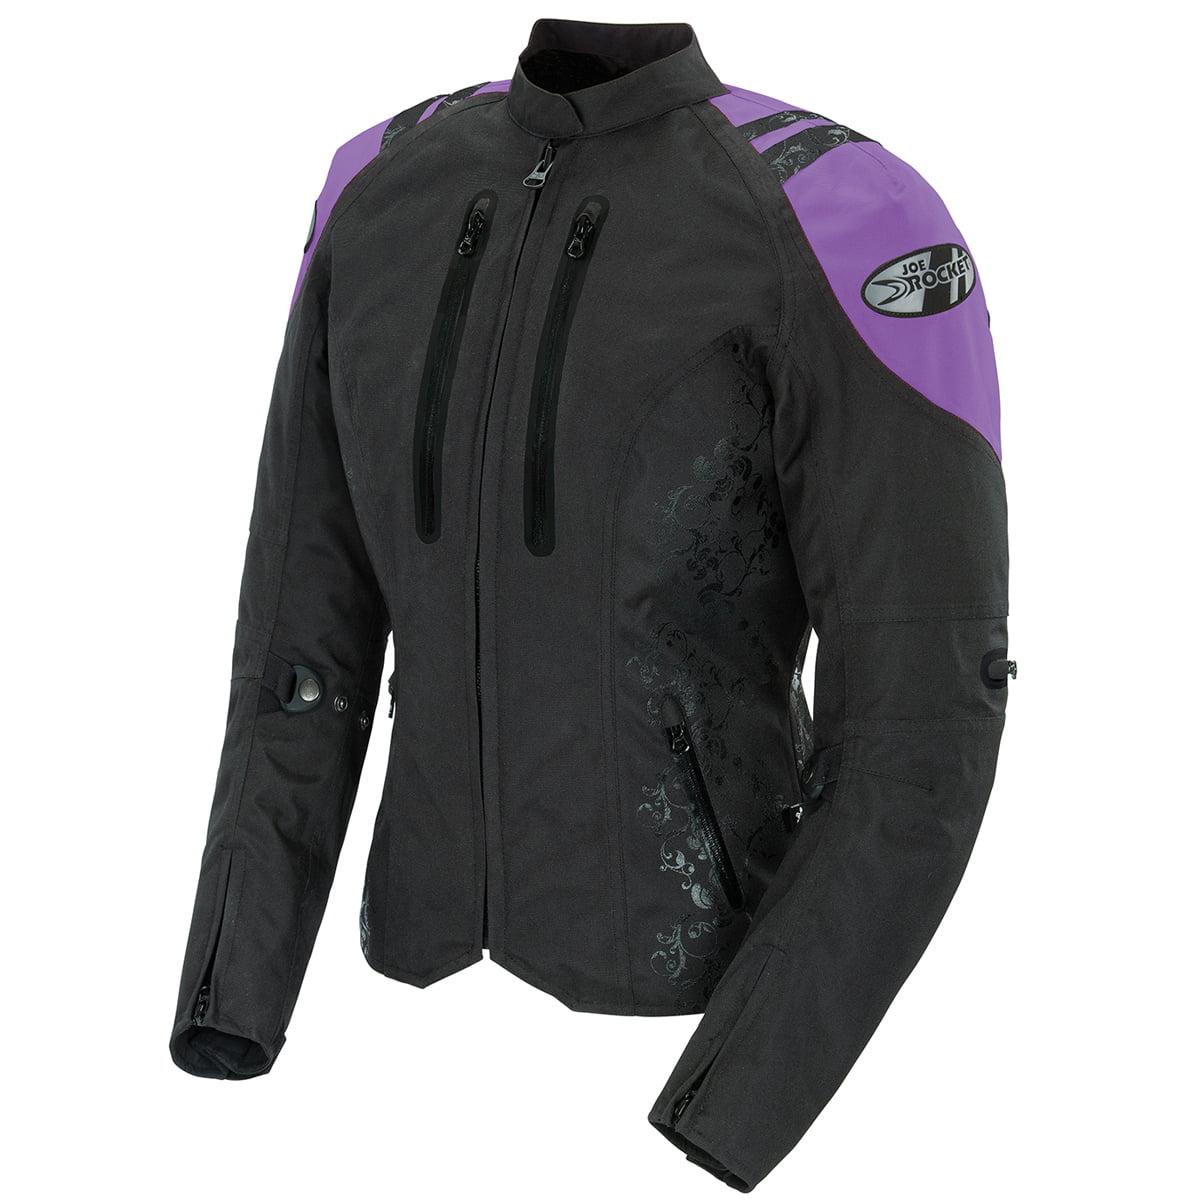 Joe Rocket Atomic 4.0 Womens Black/Purple Textile Motorcycle Jacket